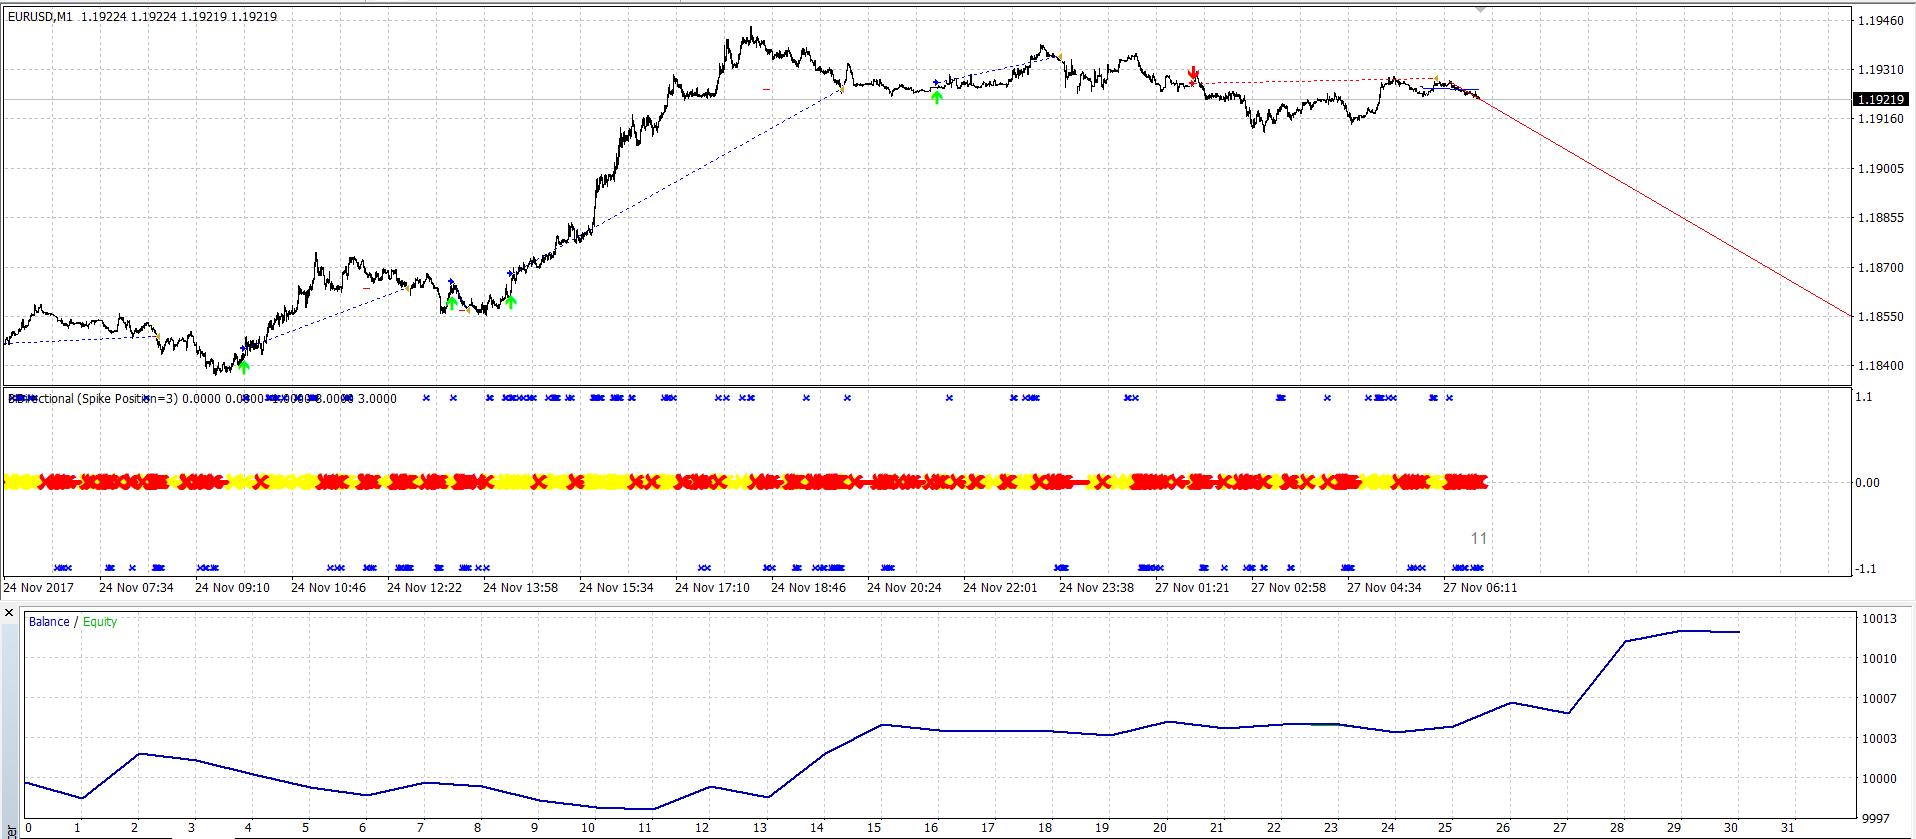 Zee Zhou Ma - altzspec - Trader's profile - Page 2 - MQL5 community